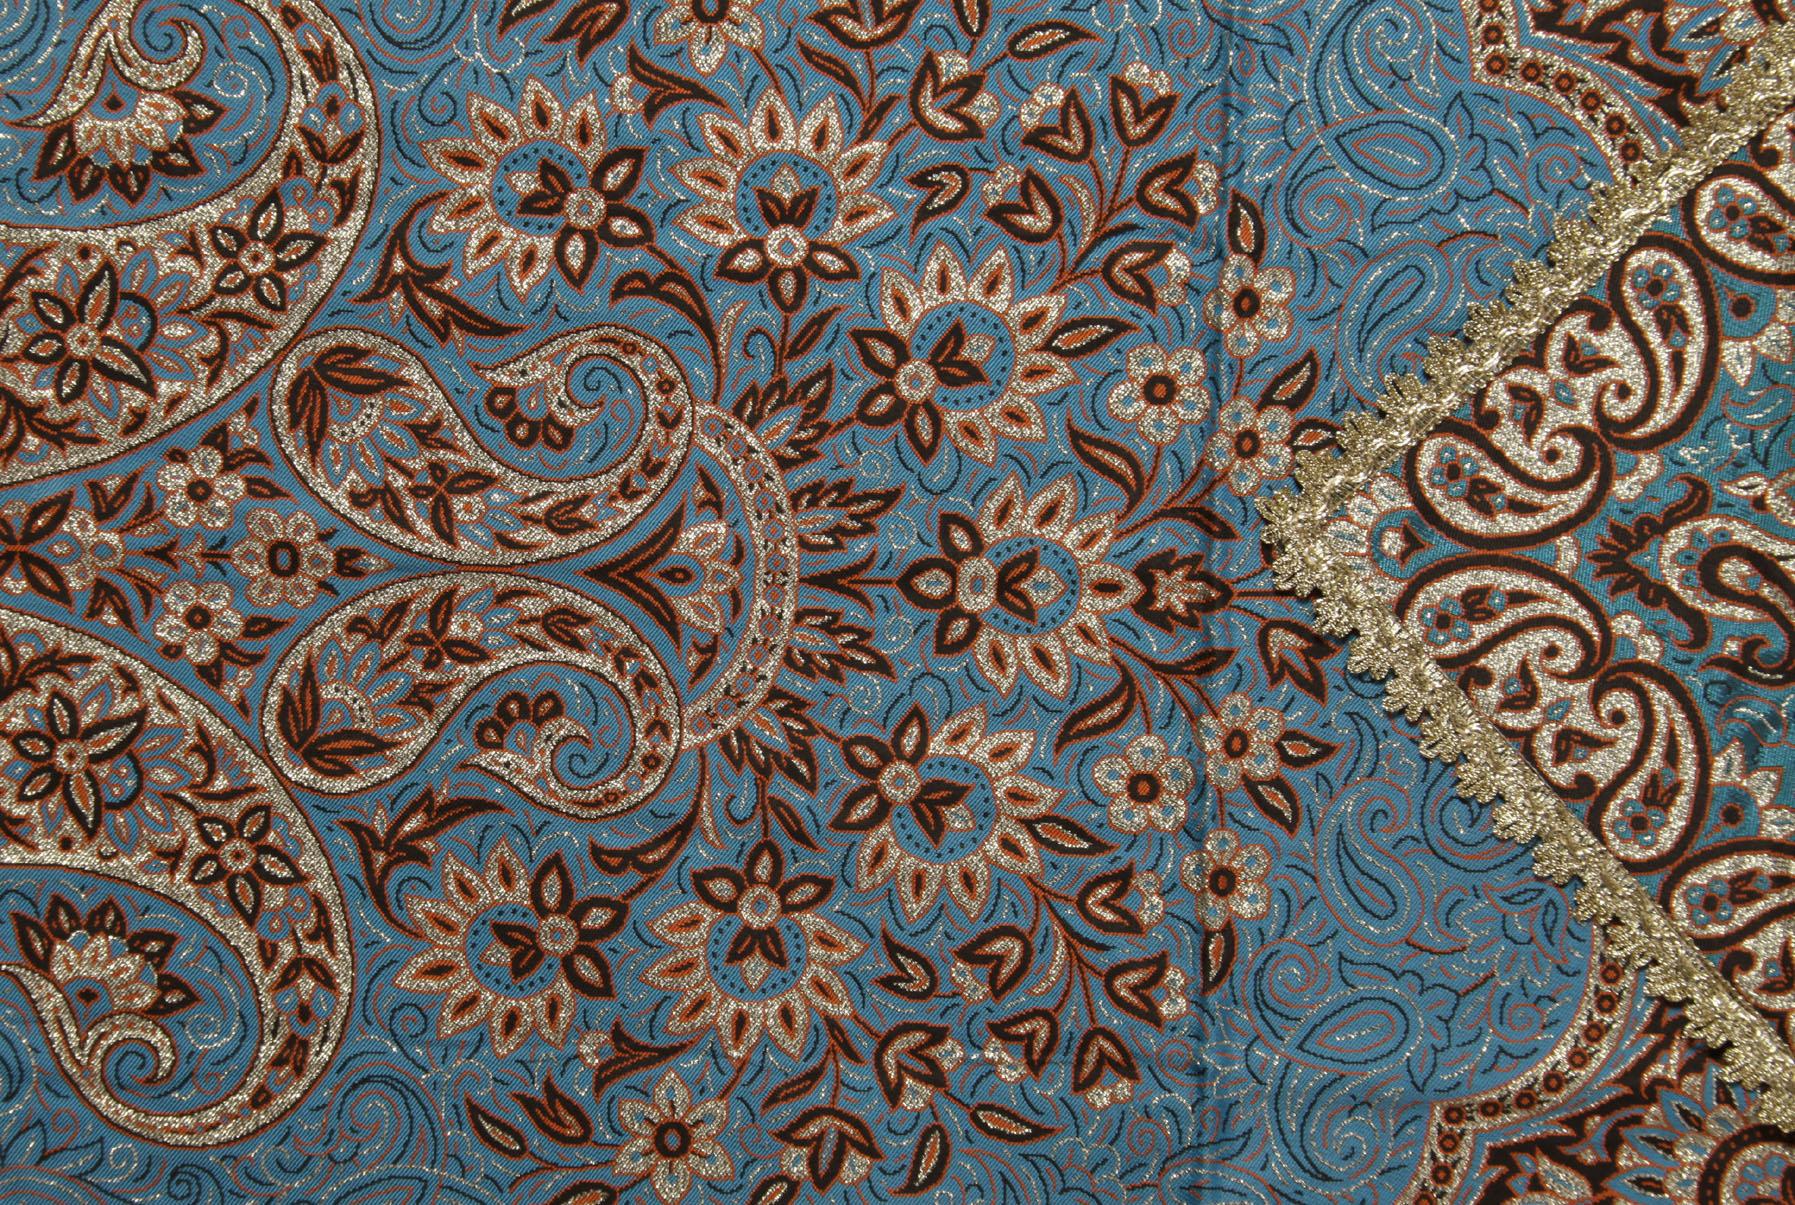 gebetsteppich aus yazd blau orient shop mevlevihane bazar. Black Bedroom Furniture Sets. Home Design Ideas